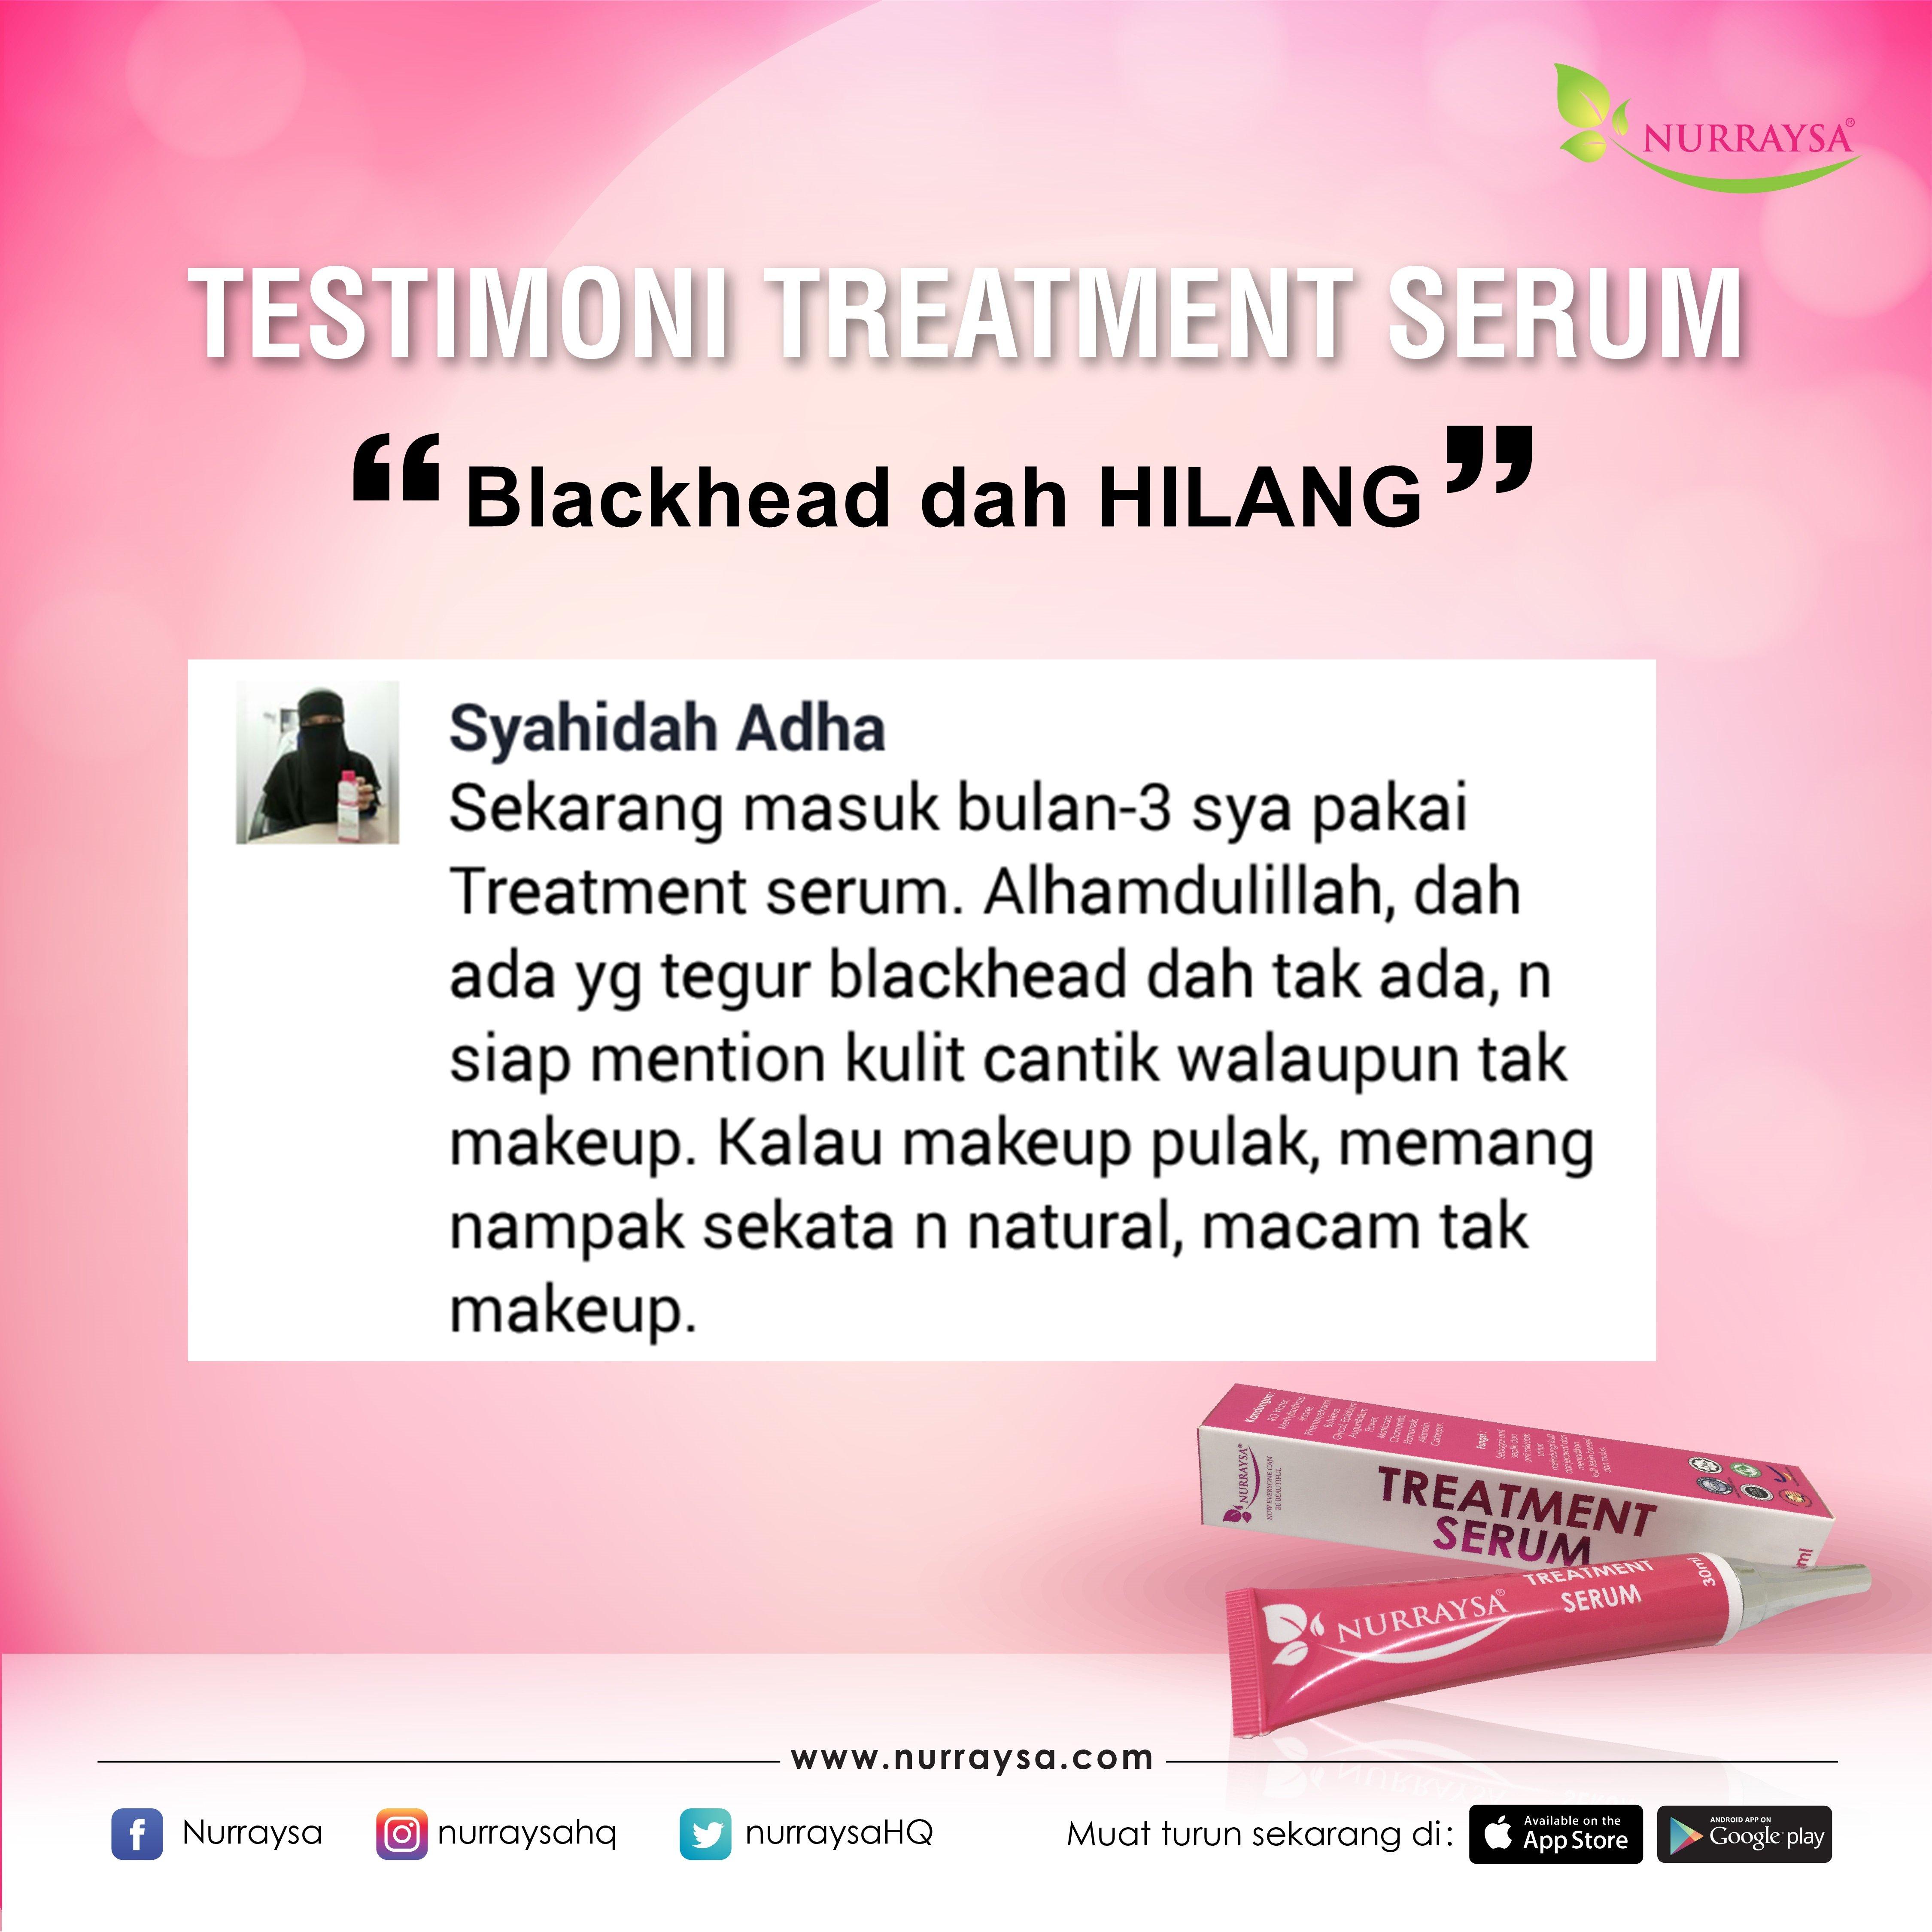 Testimoni Treatment Serum 3